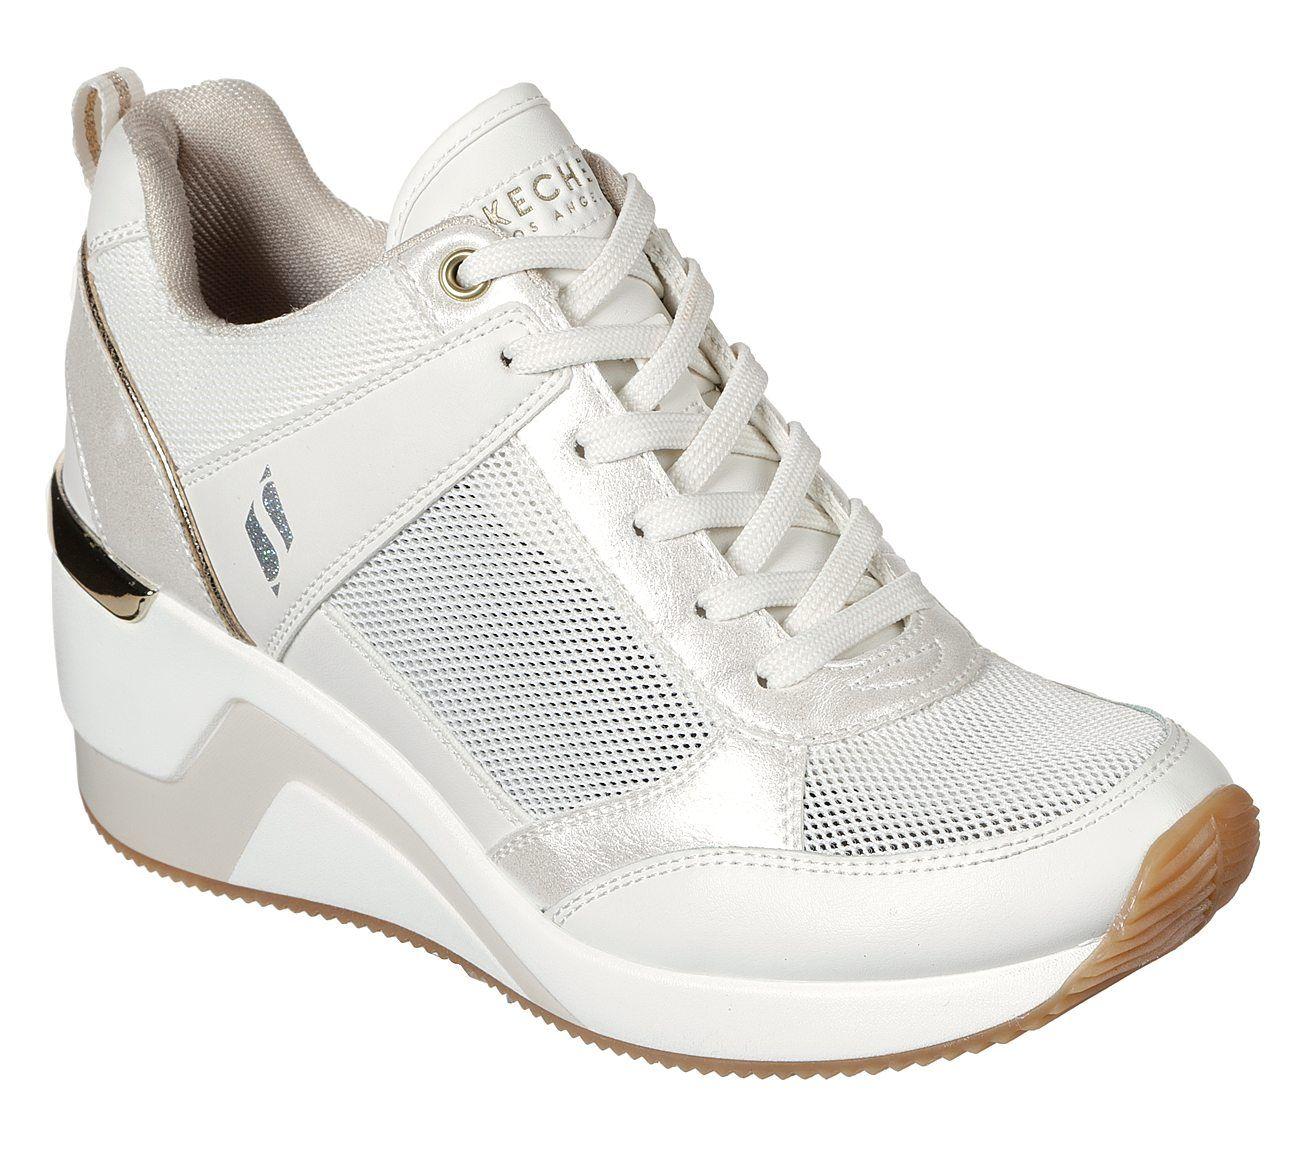 skechers wedge heel sneakers